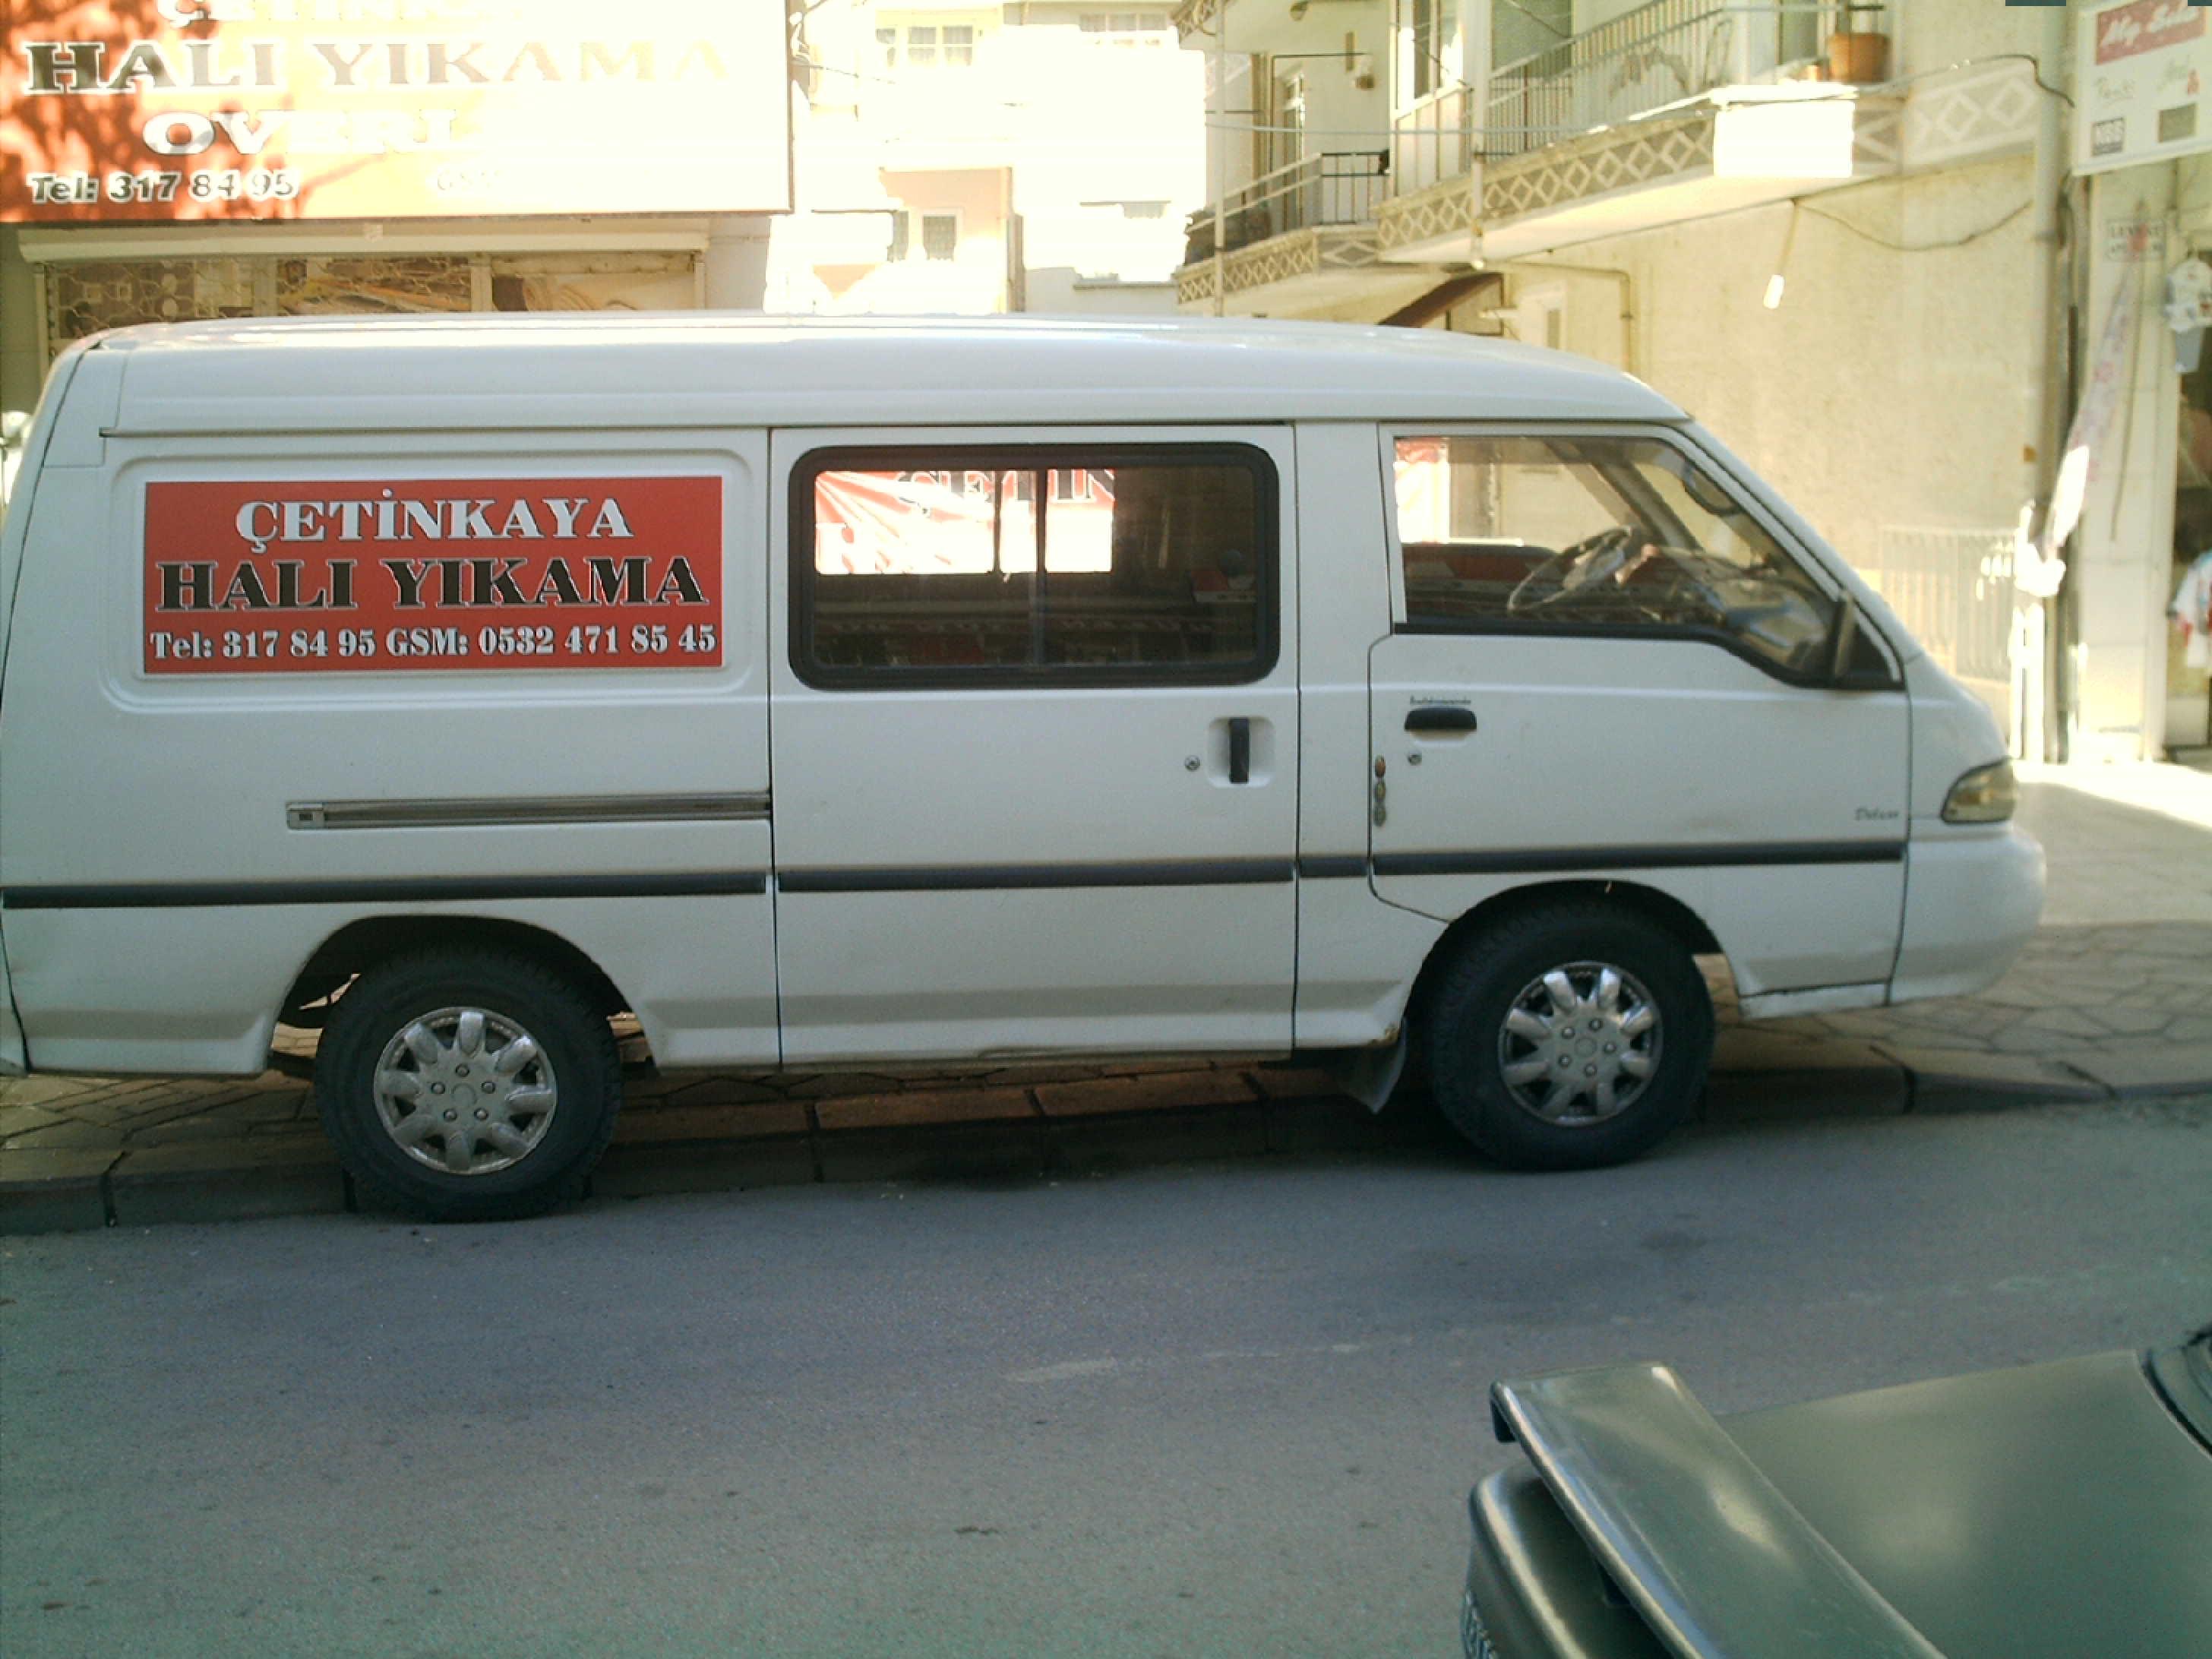 tunahan_hali_yikama_servis_araci